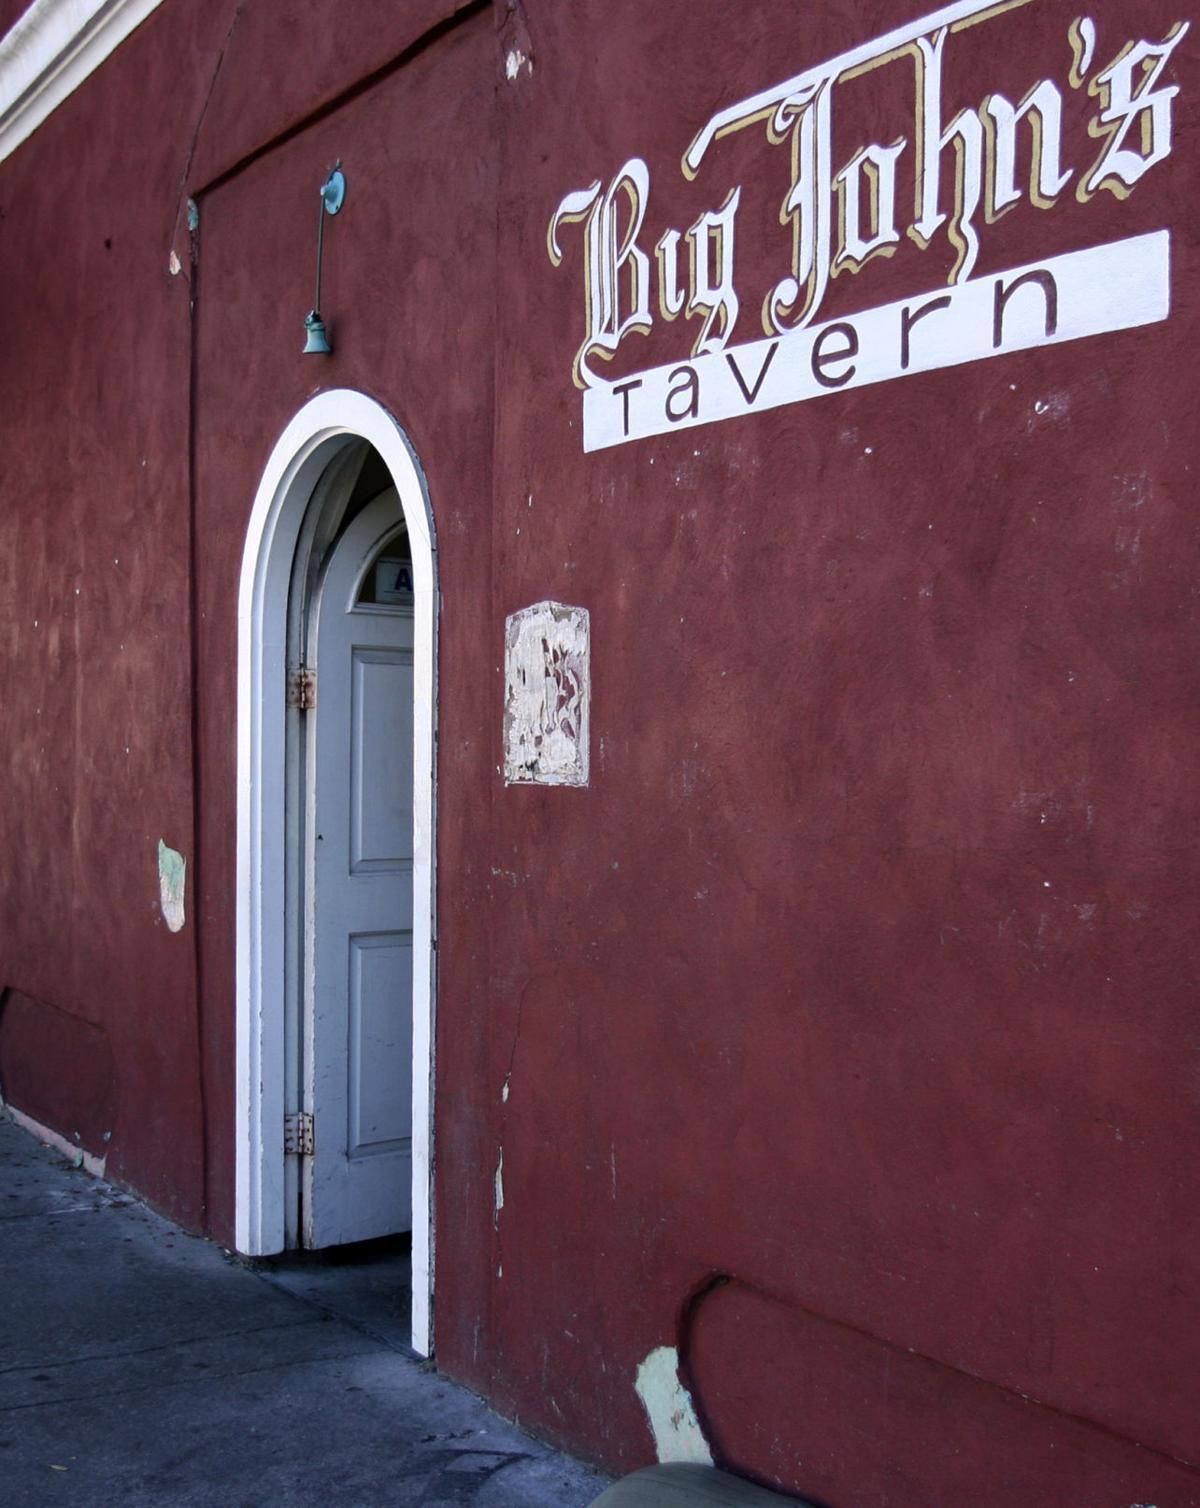 Big John's Tavern closes abruptly, announces partnership with Rarebit owner